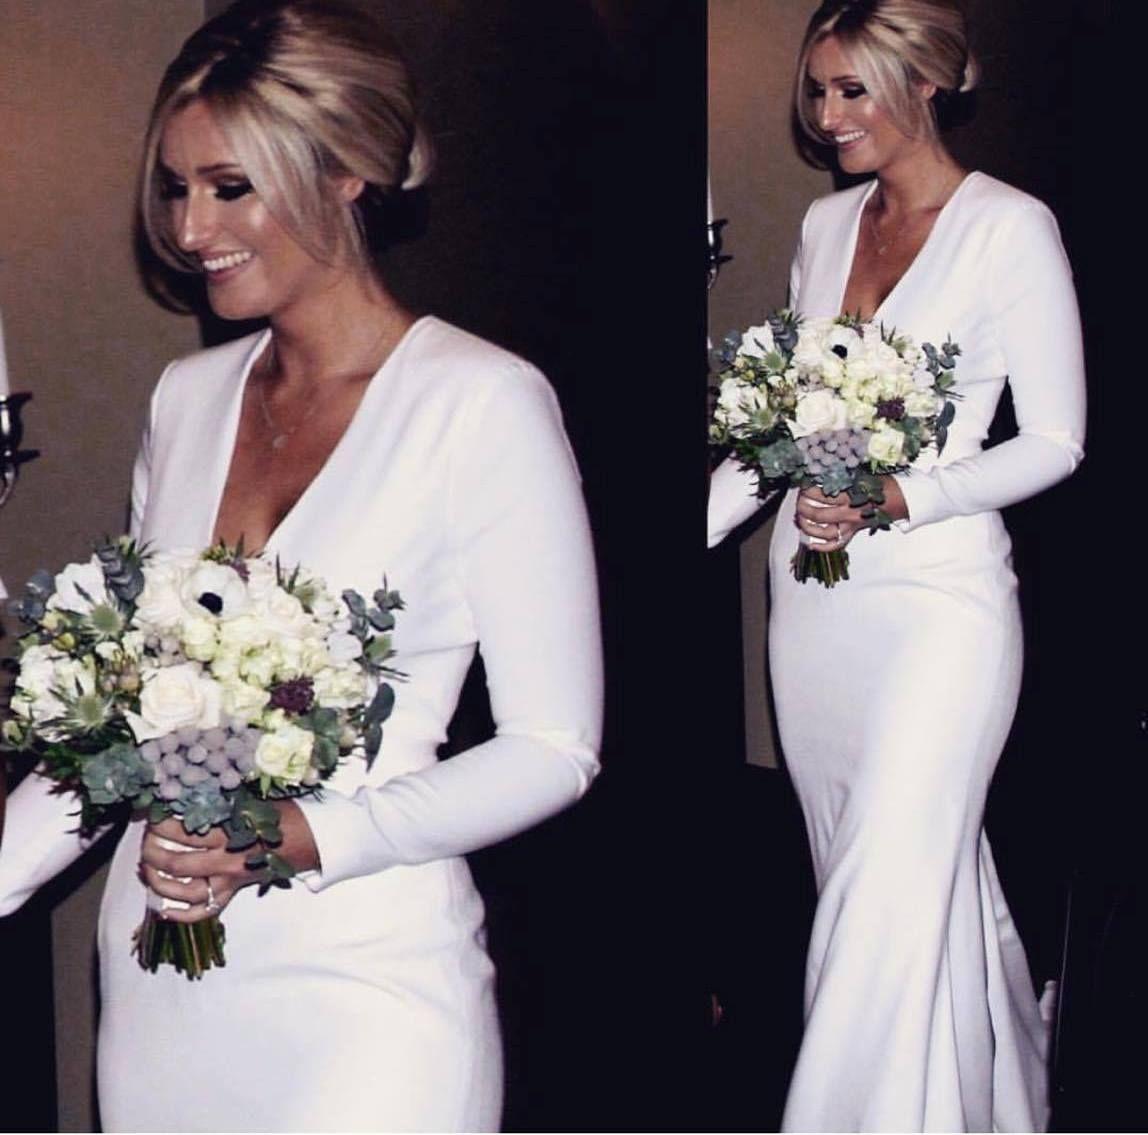 Emma beaumont silk crepe simple wedding dress with low v neck emma beaumont silk crepe simple wedding dress with low v neck ombrellifo Choice Image